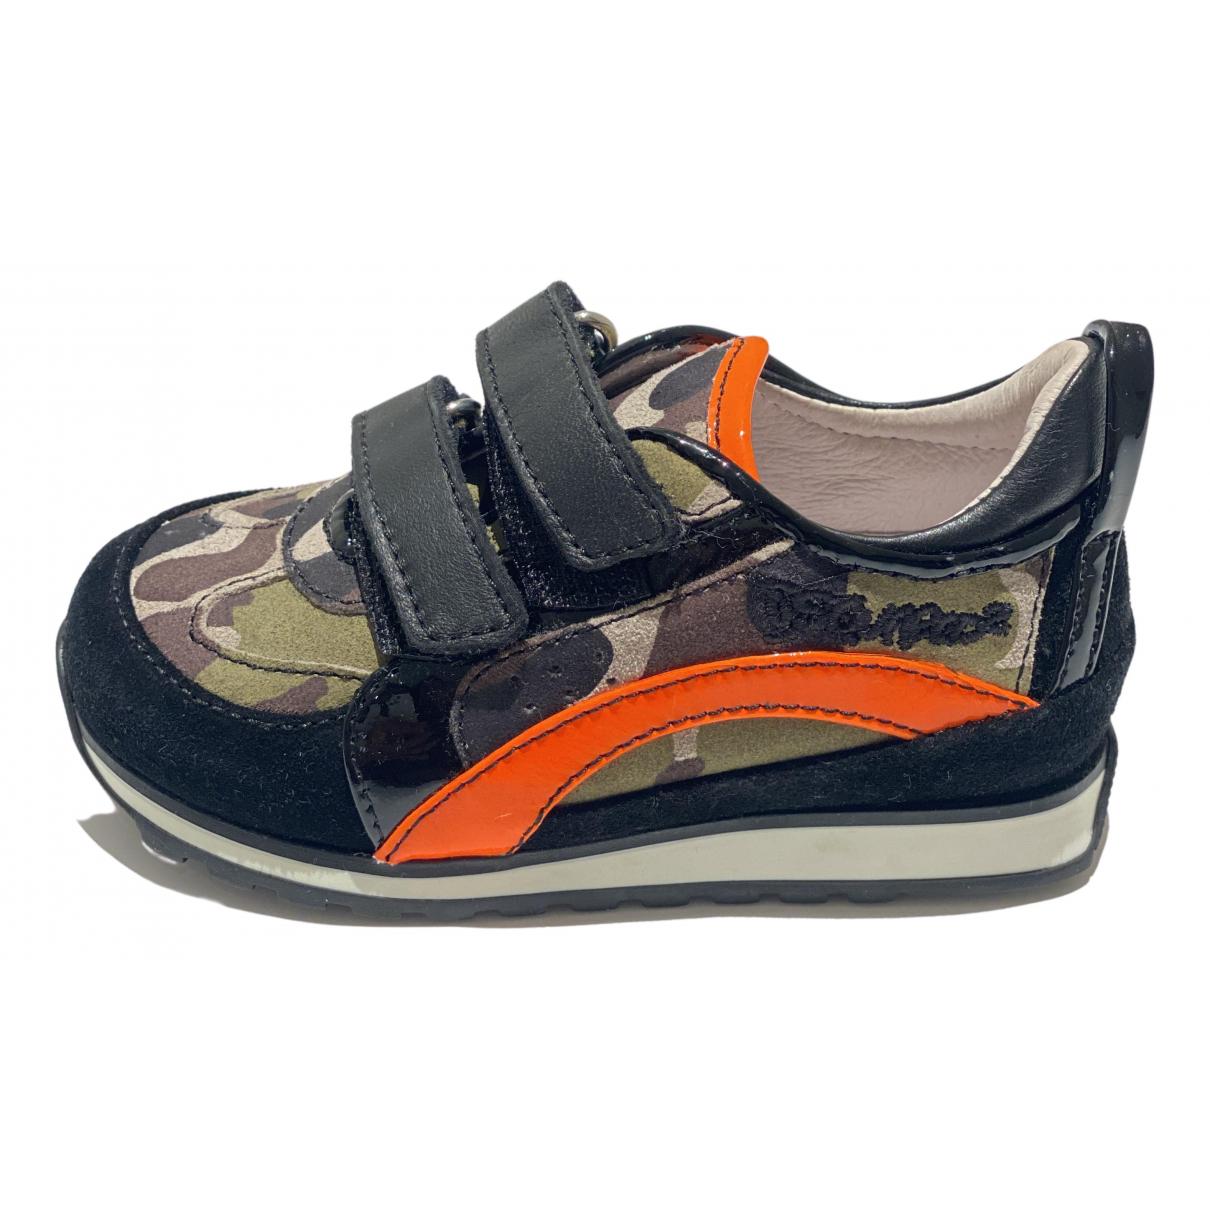 Dsquared2 \N Sneakers in  Schwarz Veloursleder